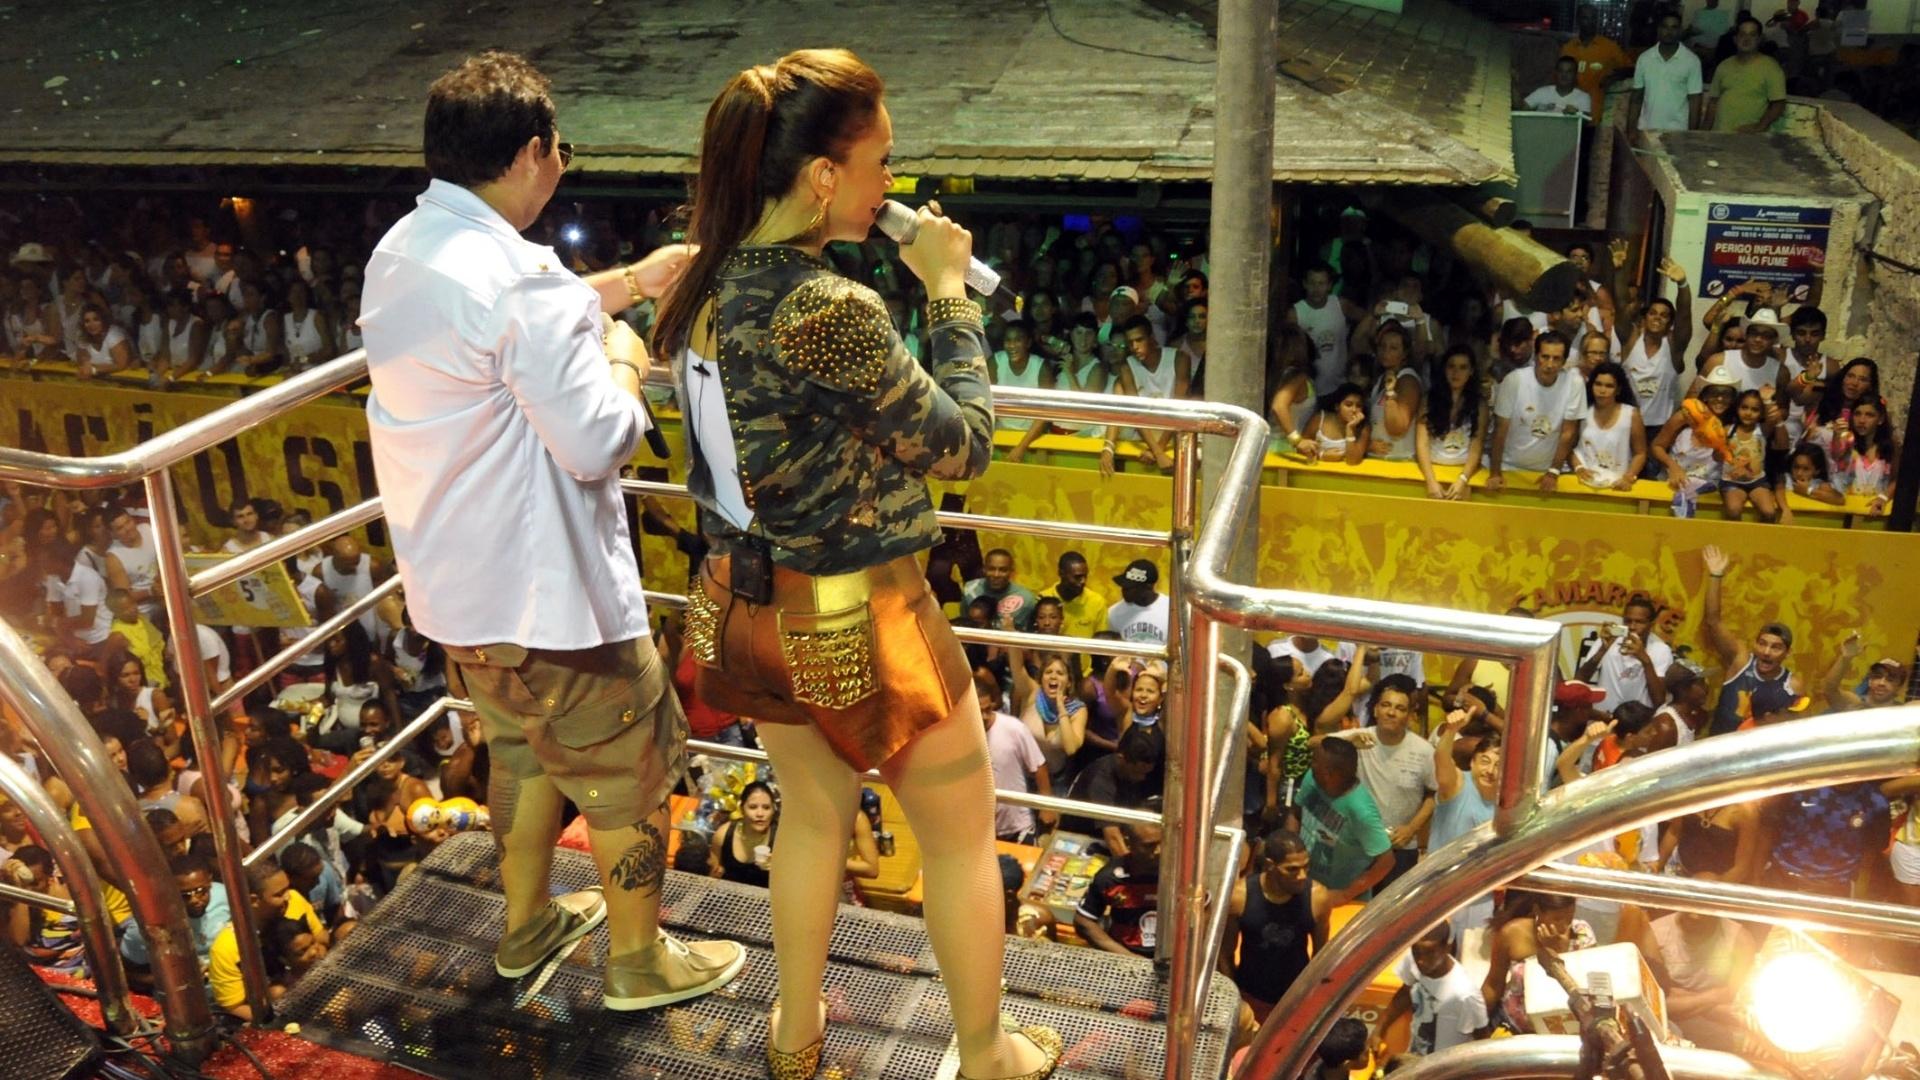 8.jan.2013 - A banda Aviões do Forró se apresenta no circuito Barra-Ondina durante o Carnaval de Salvador